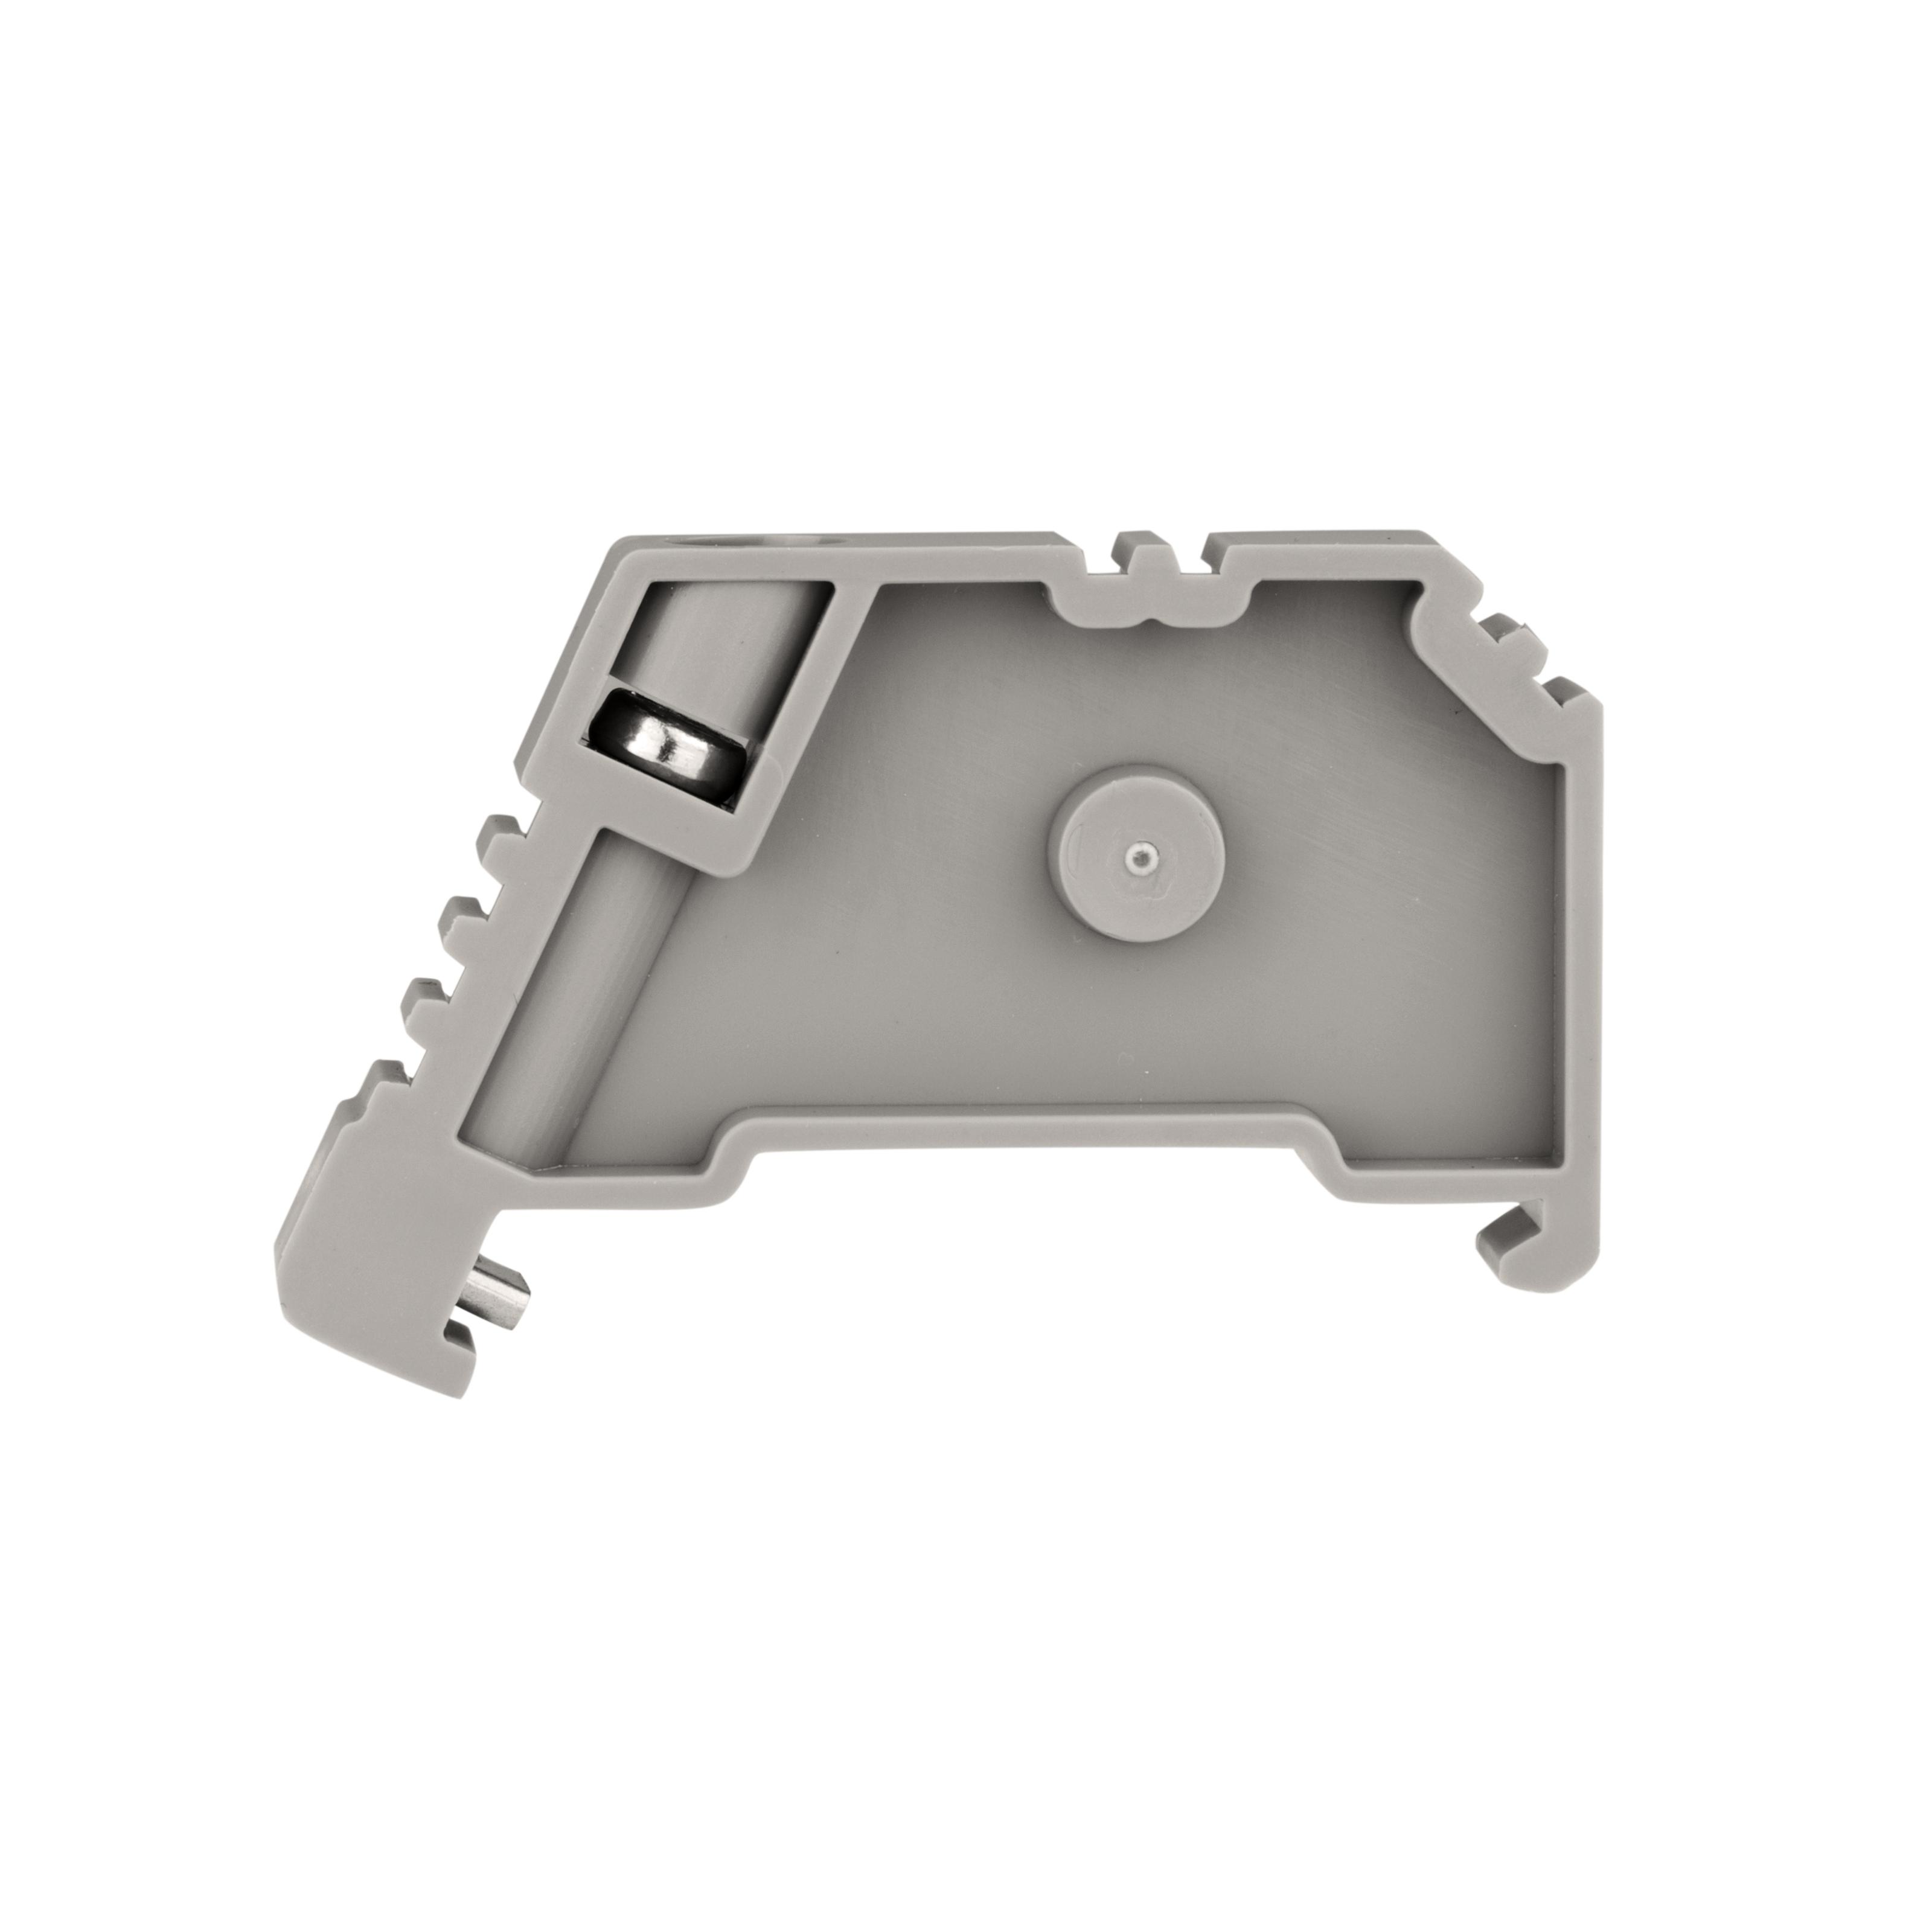 Cleme sir-conexiune cu surub IK632648